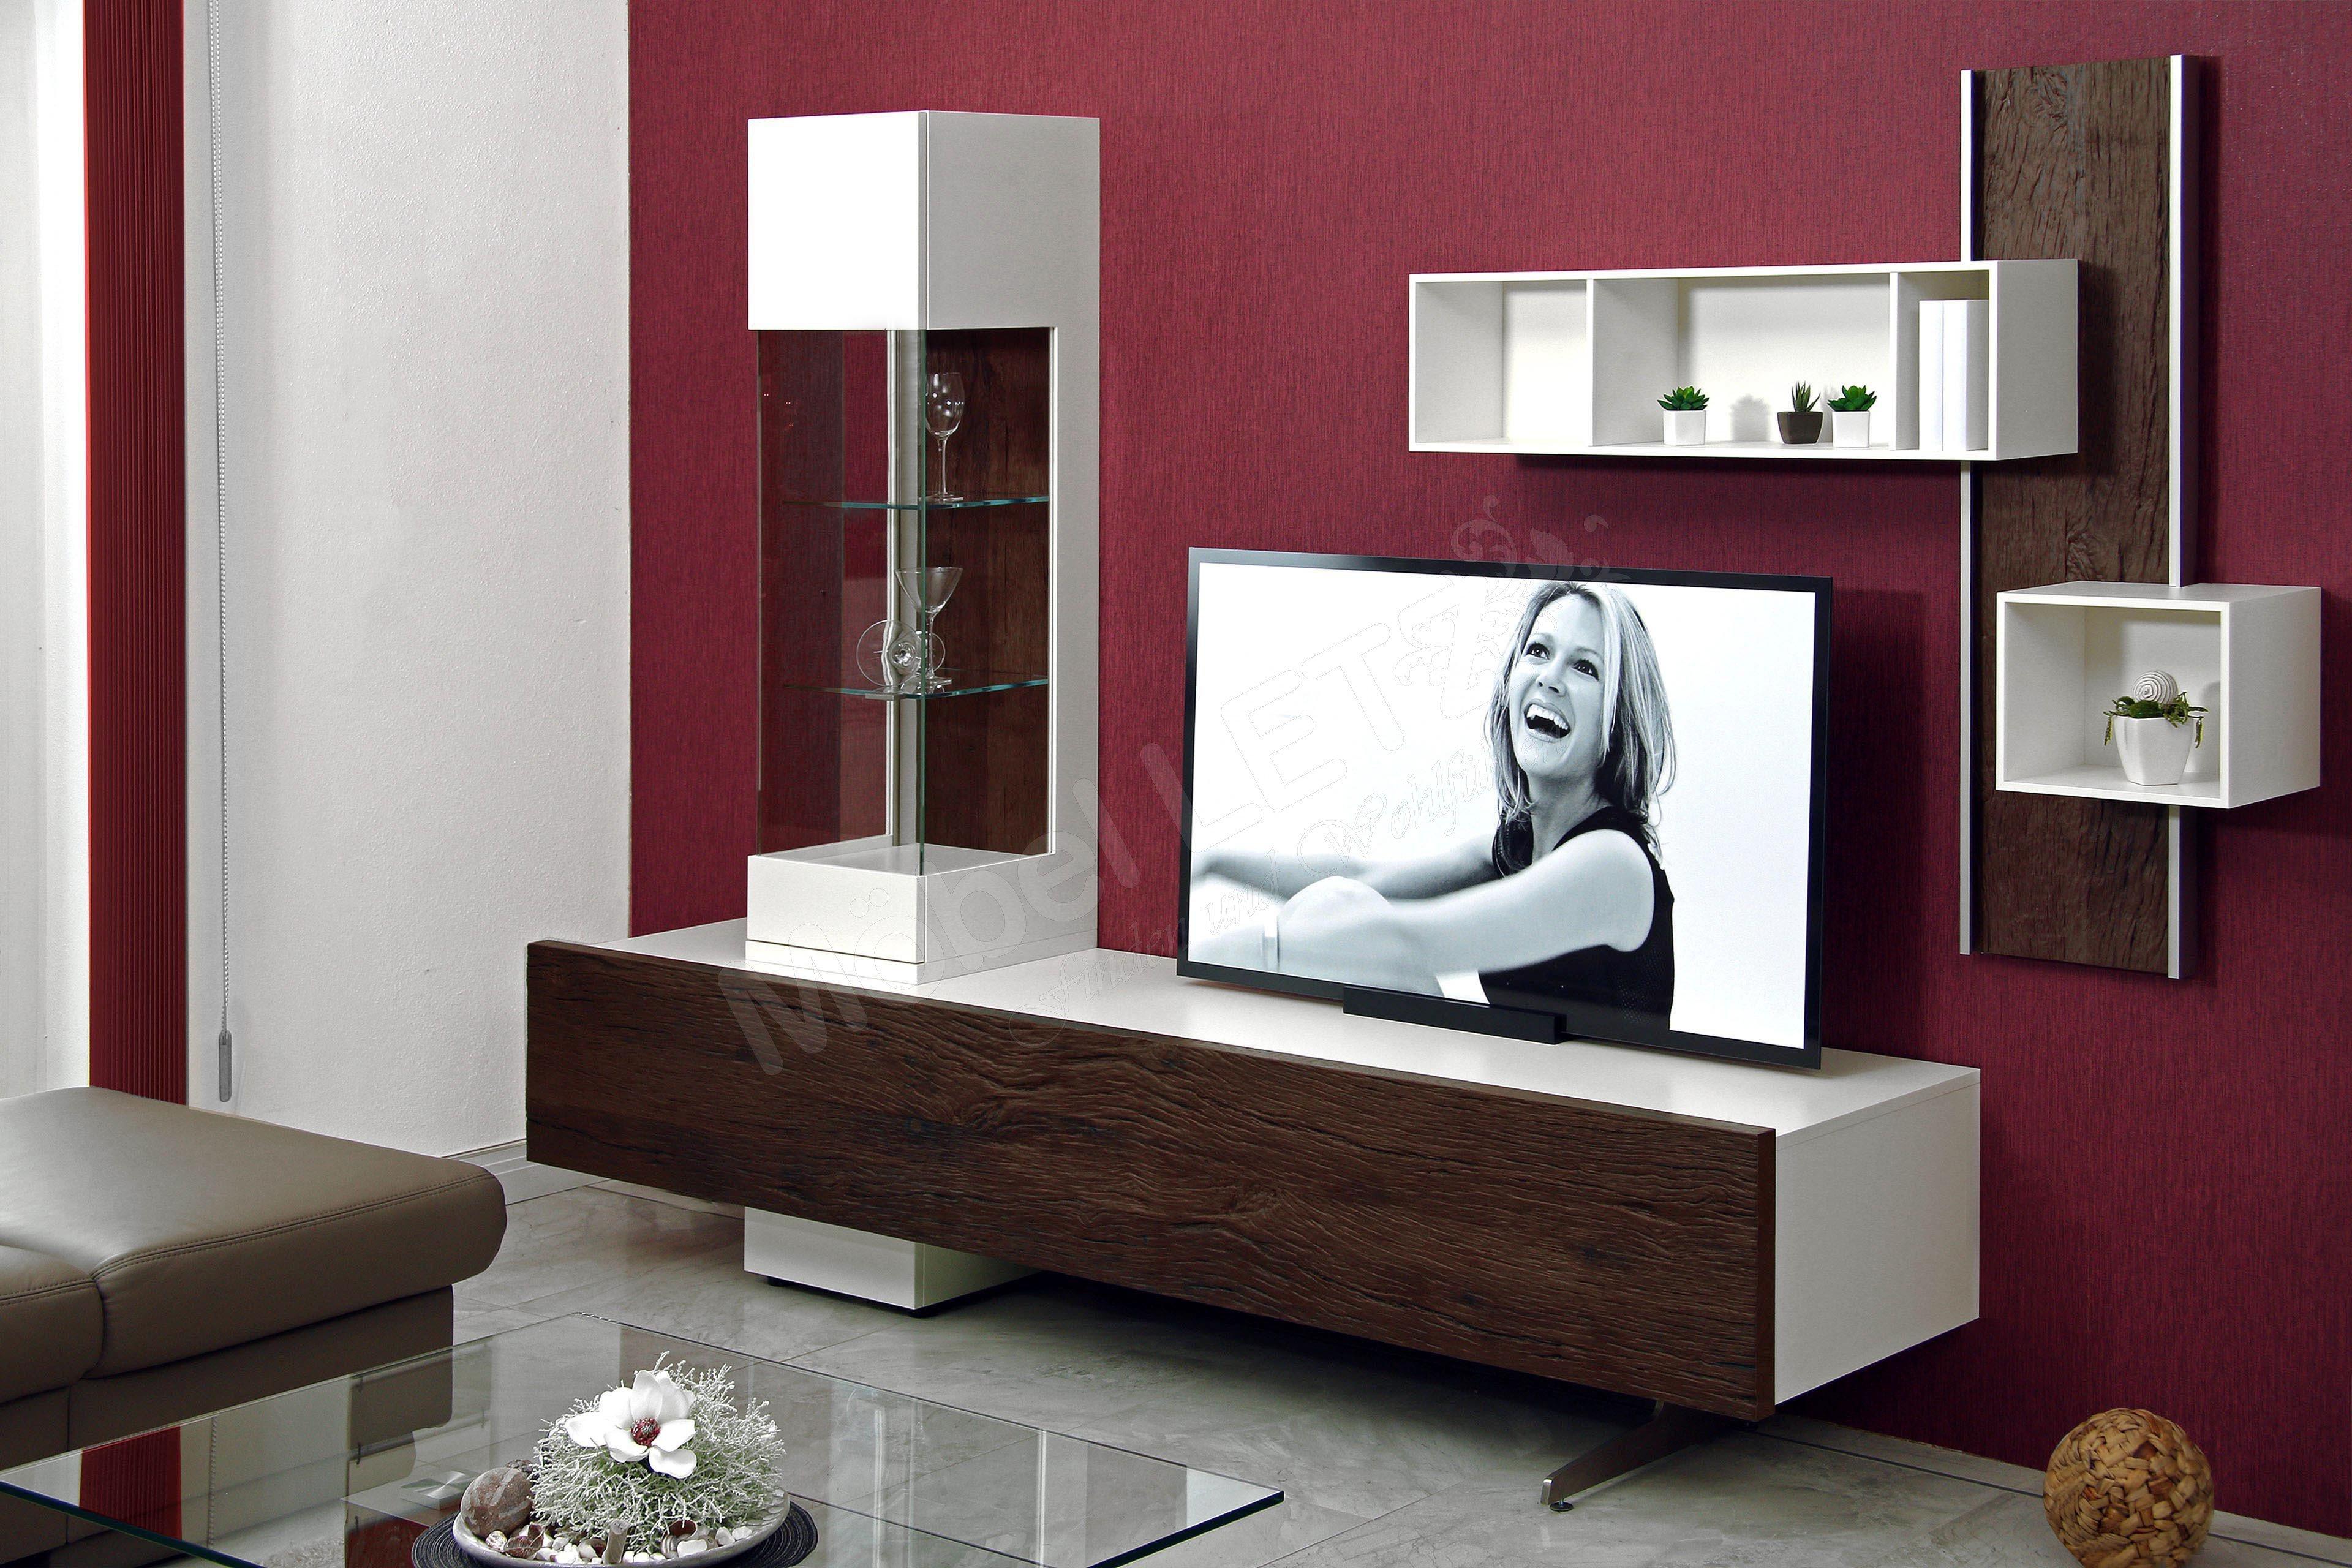 gwinner international wohnwand bohle bl1 wei eiche. Black Bedroom Furniture Sets. Home Design Ideas